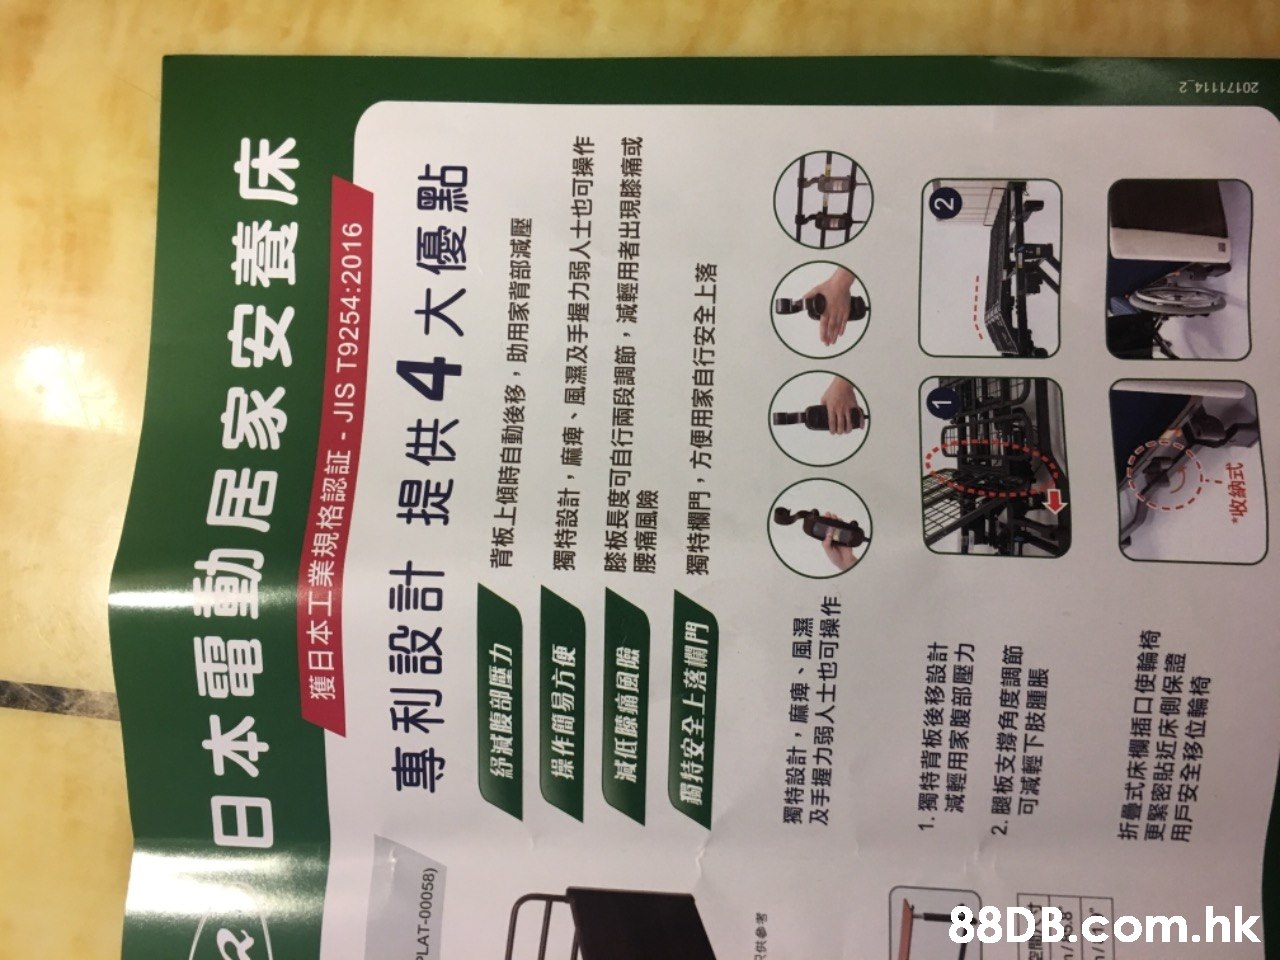 20171114 2 -.hk 2日本電動居家安養床 獲日本工業規格認証-JIS T9254:2016 專利設計 提供4大 優點 PLAT-00058) 舒減腹部壓力 背板上傾時自動後移,助用家背部減壓 操作簡易方便 獨特設計,麻痺、風濕及手握力弱人士也可操作 膝板長度可自行兩段調節,減輕用者出現膝痛或 腰痛風險 減低膝痛風險 獨持安全上落欄門 獨特欄門,方便用家自行安全上落 マ供參考 獨特設計,麻疼、風濕 及手握力弱人士也可操作 1.獨特背板後移設計 減輕用家腹部壓力 2.腿板支撐角度調節 可減輕下肢腫脹 折疊式床欄插口使輪椅 更緊密貼近床側保證 用戶安全移位輪椅 *收納式  Font